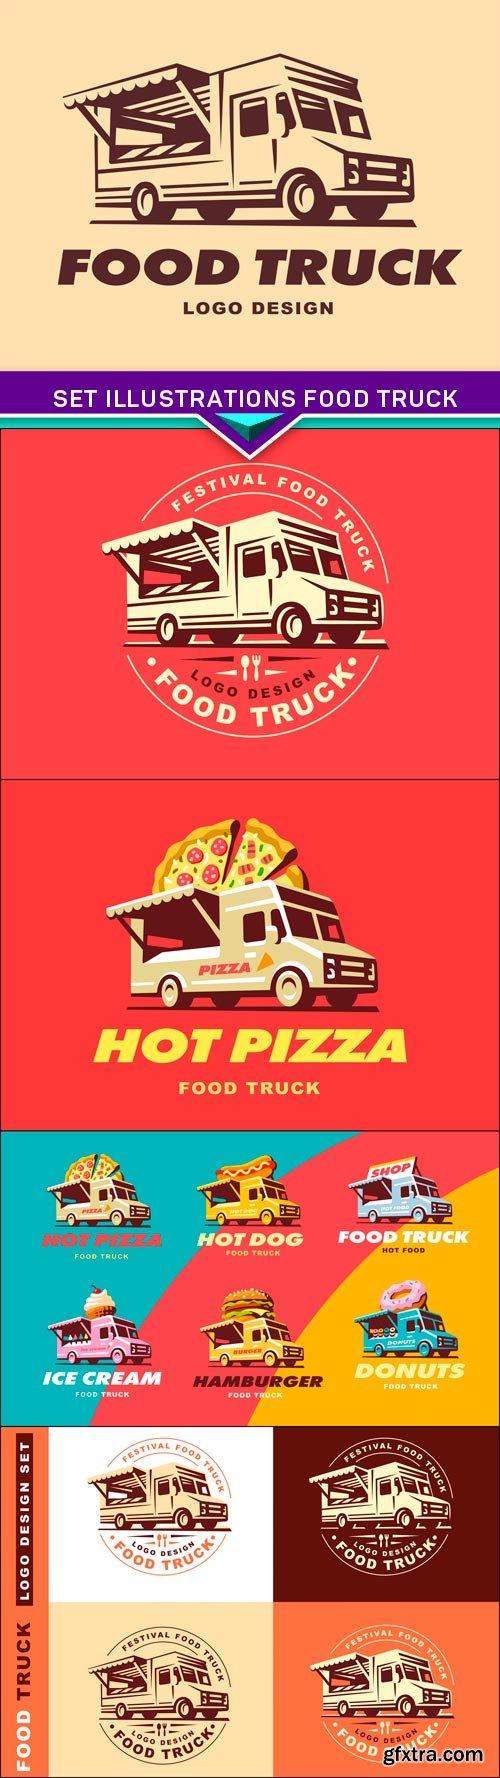 Set illustrations food truck 5X EPS